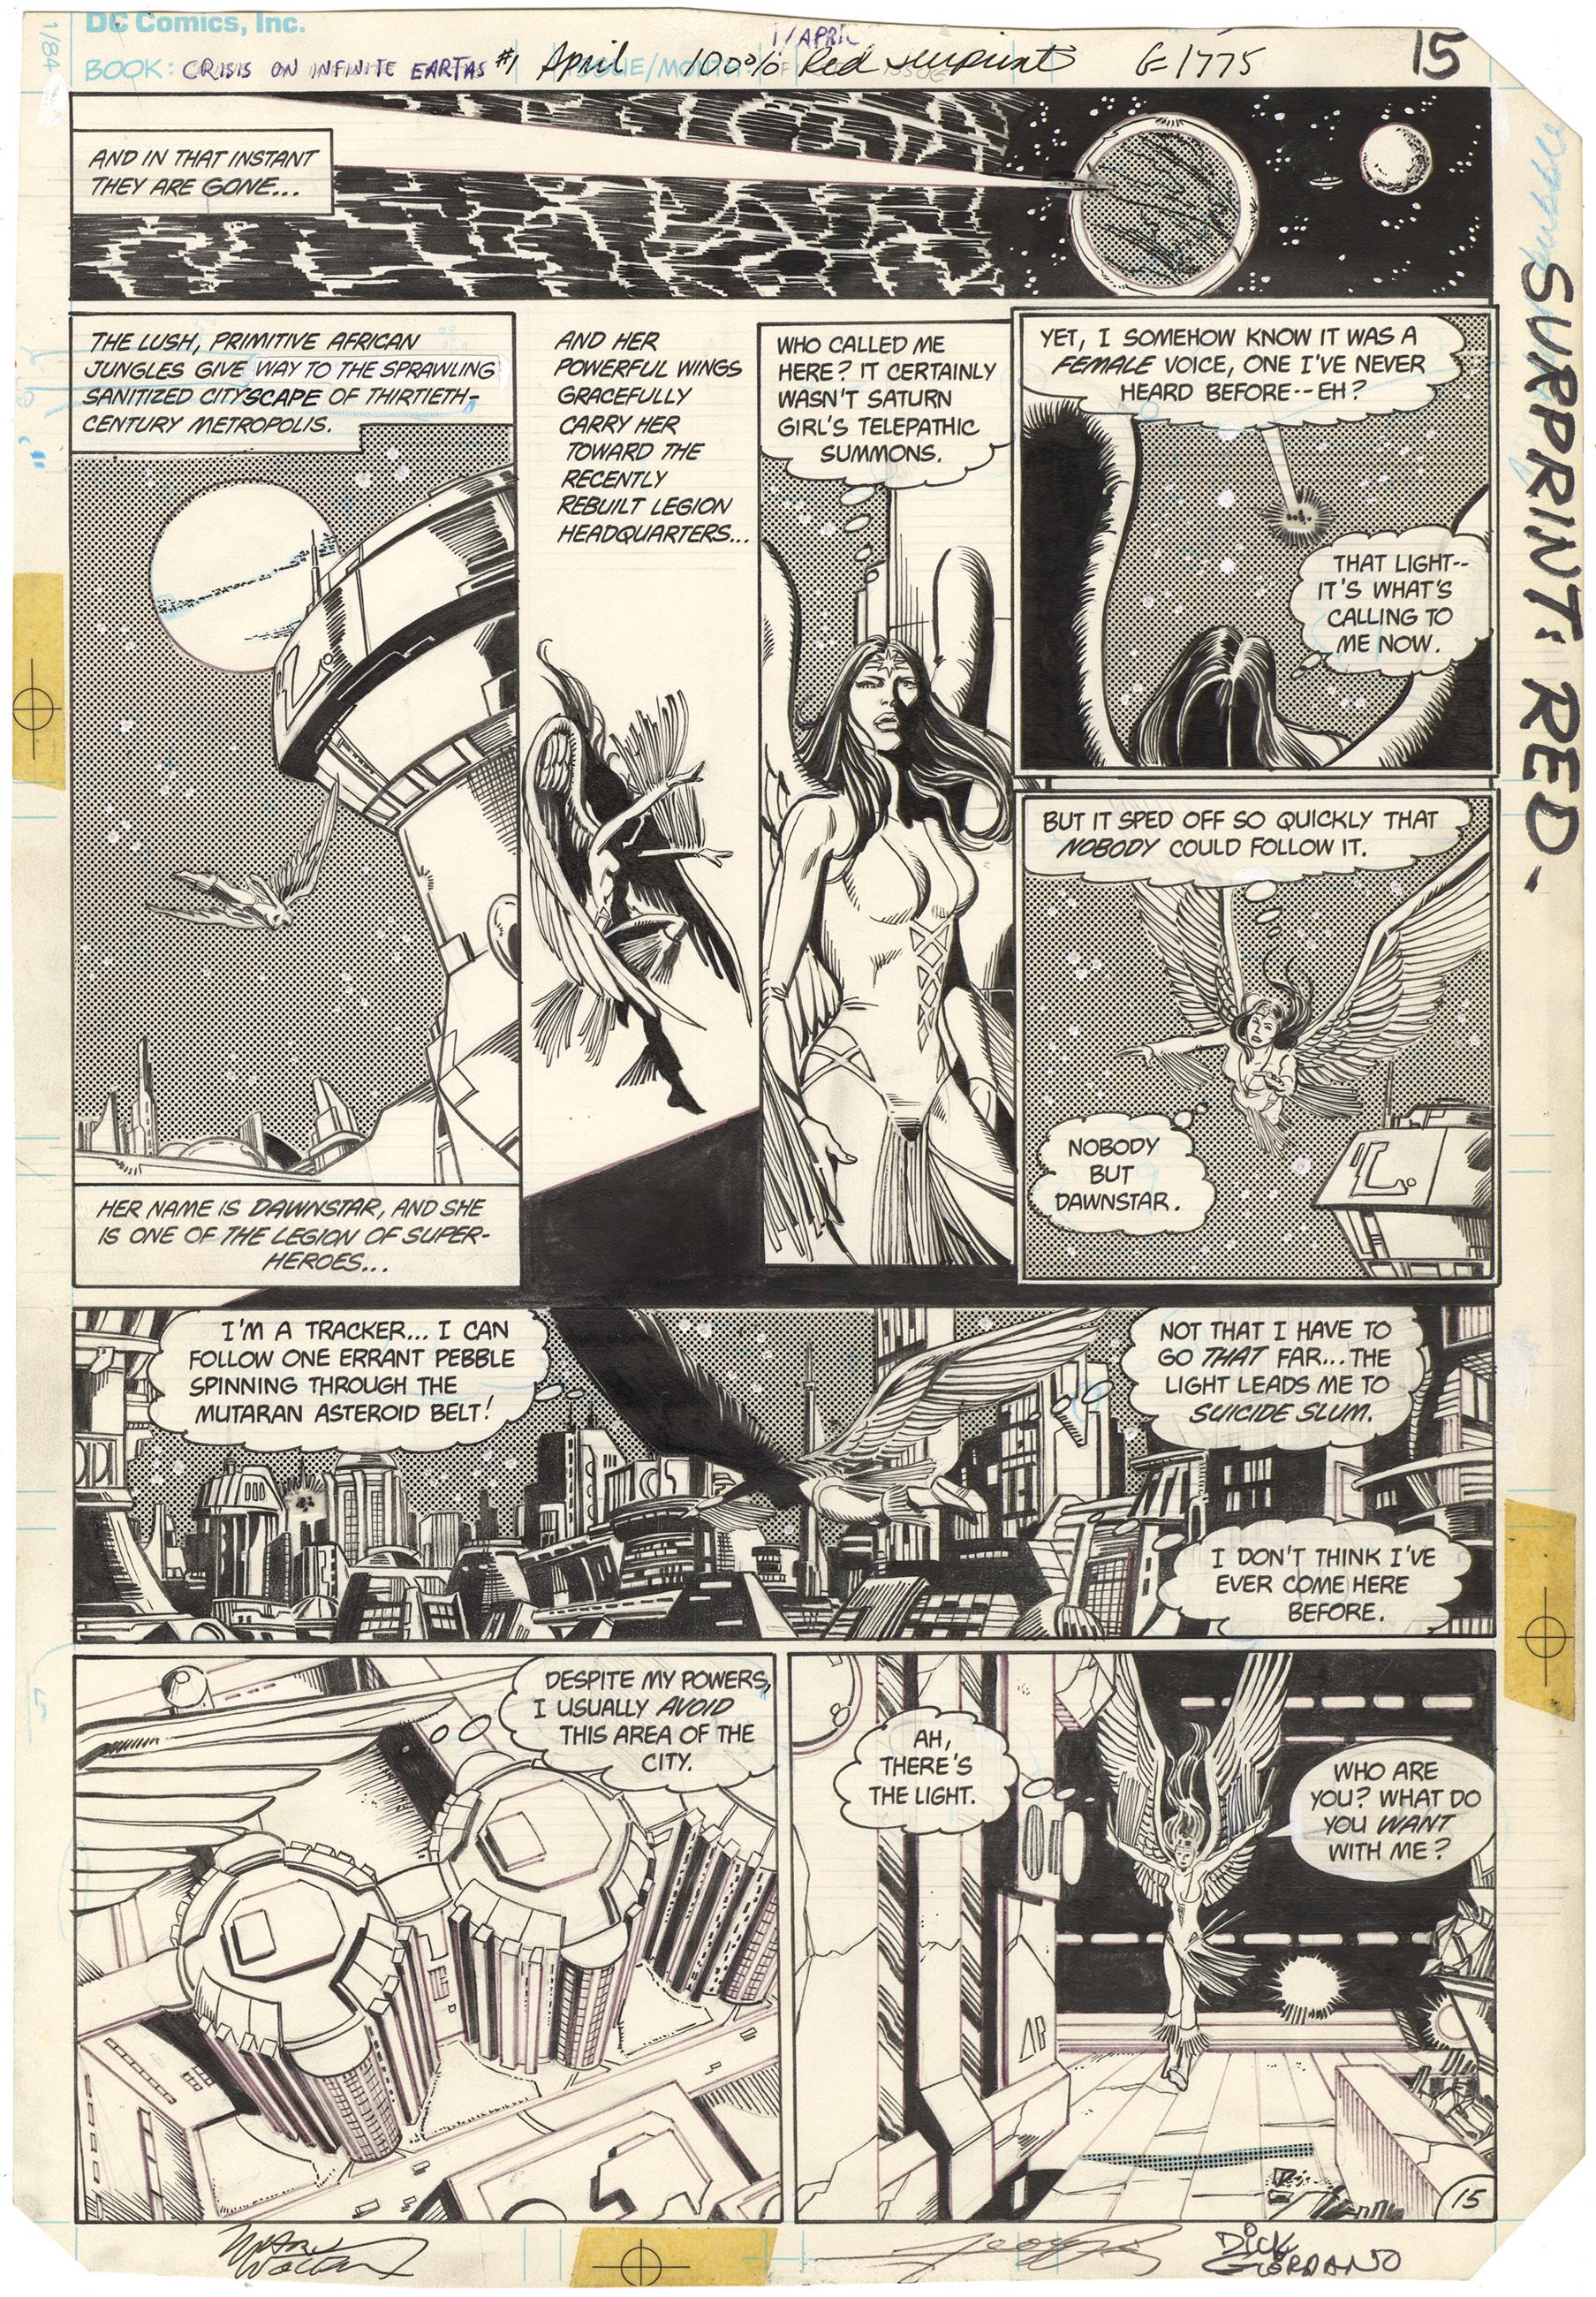 Crisis on Infinite Earths #1 p15